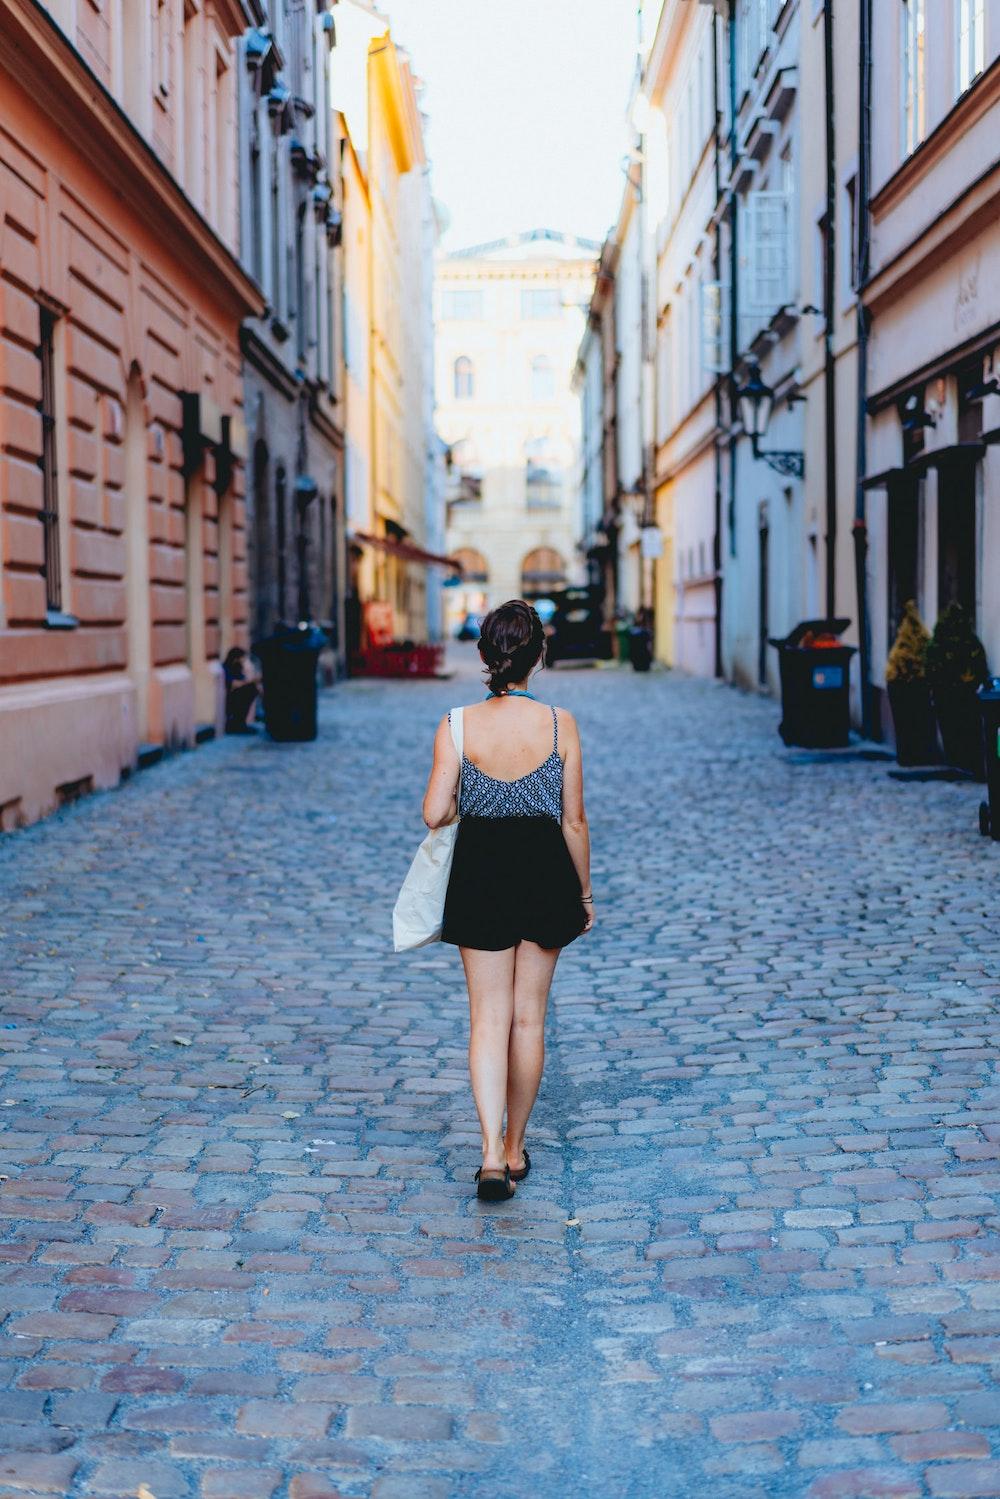 Girl walking in Prague Old Town streets